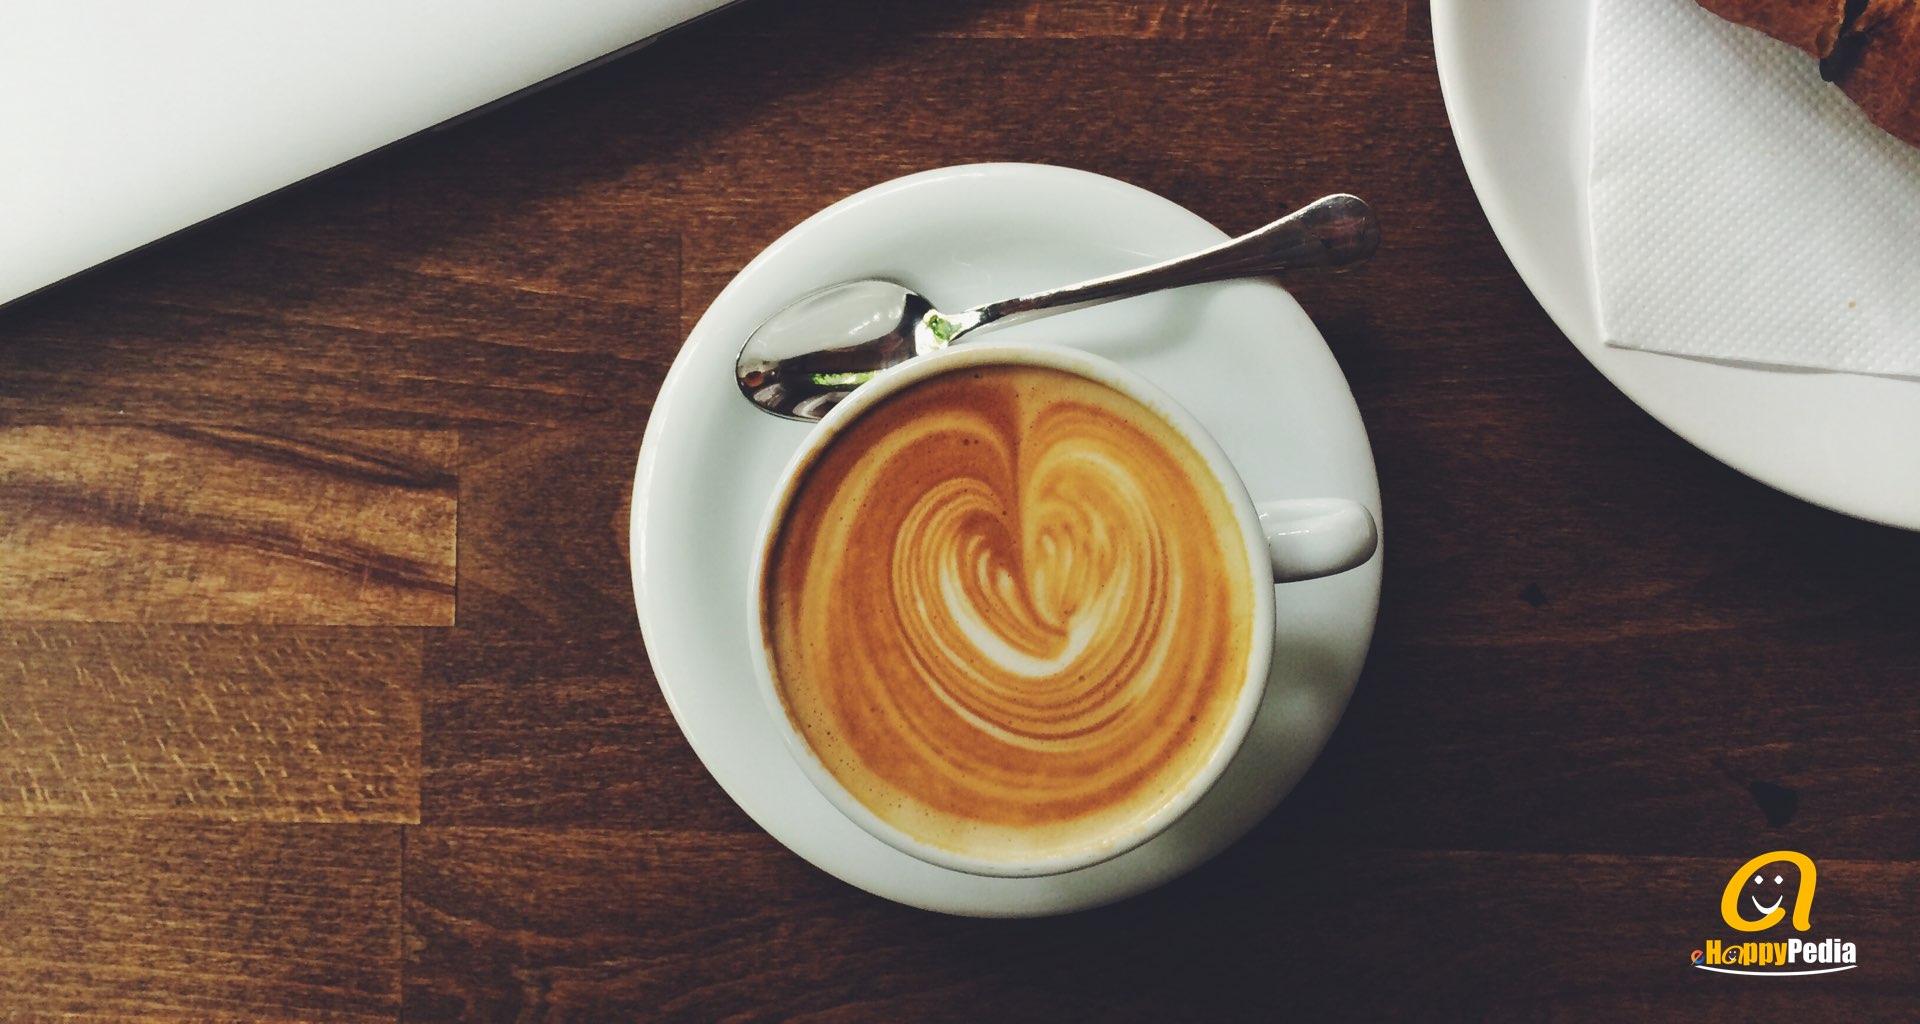 blog - coffee table love.jpeg